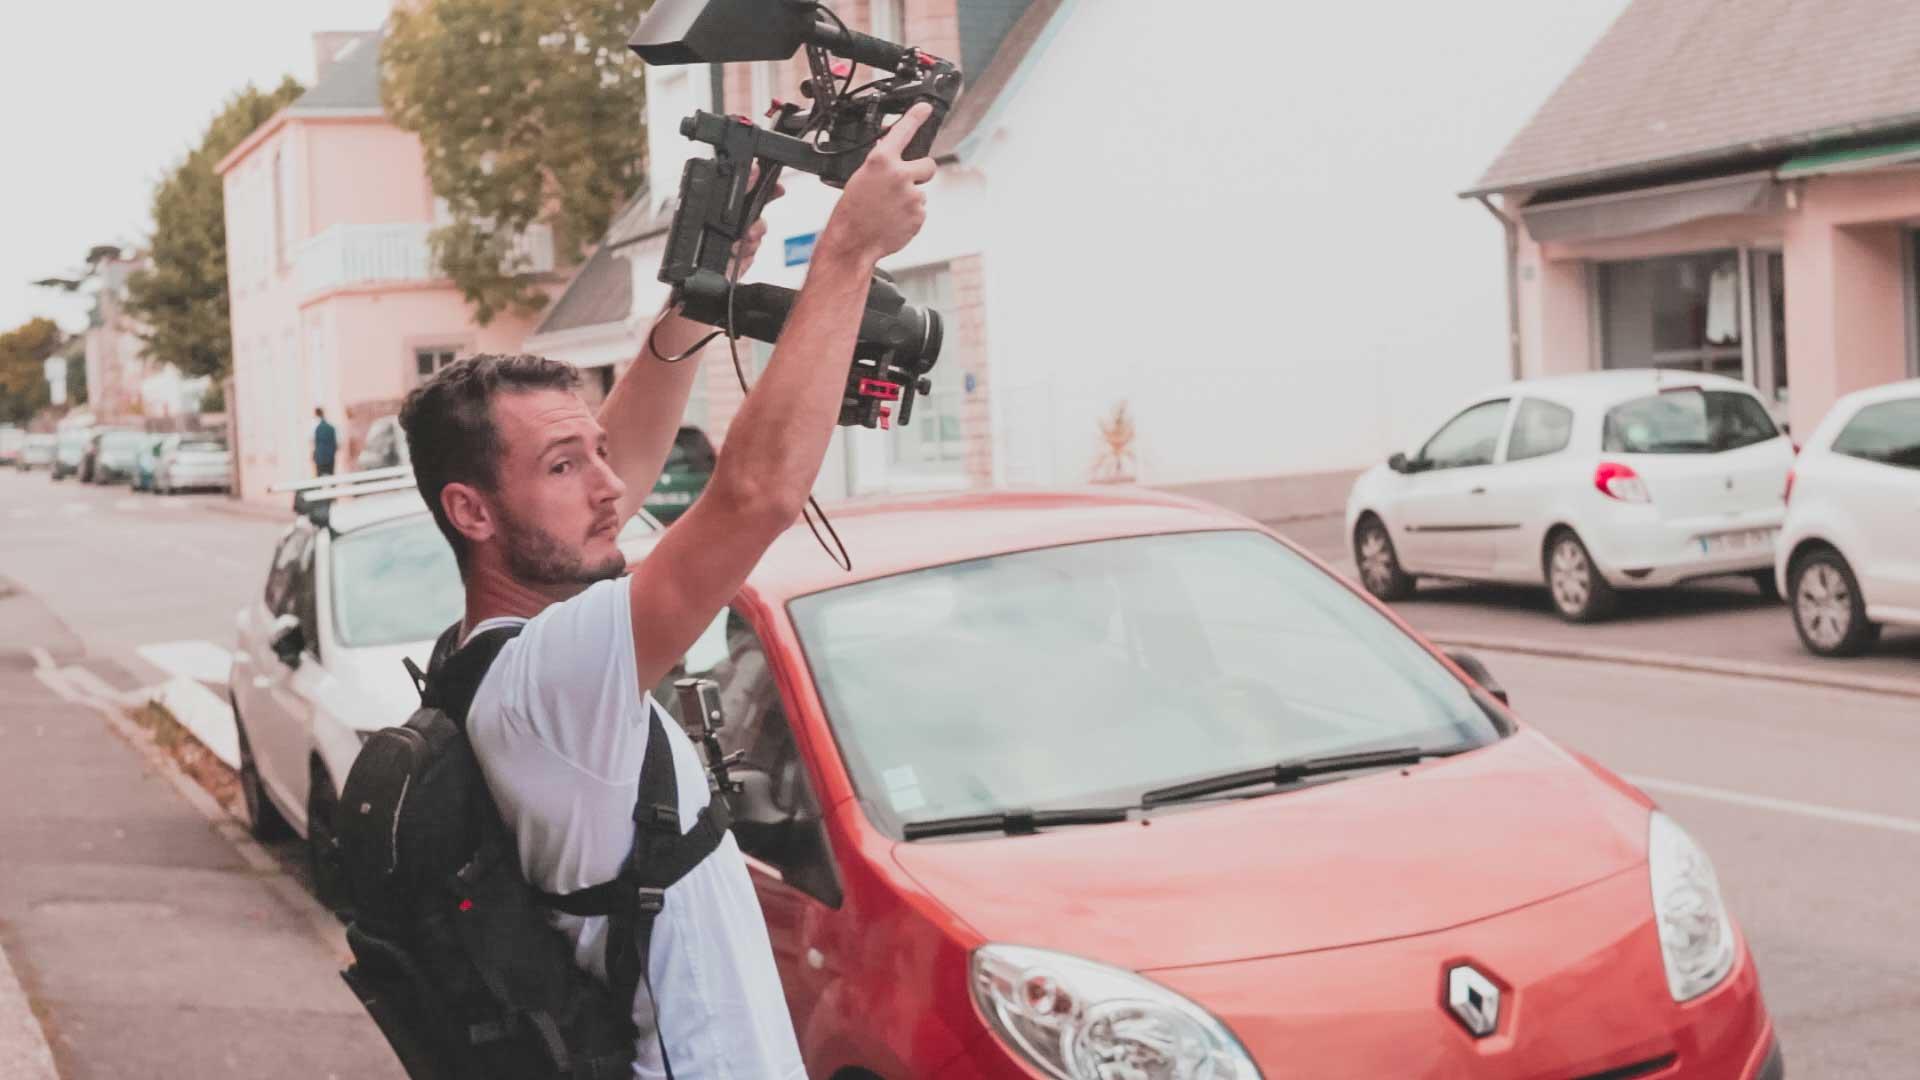 0005---Maxime-Bodivit-Vision-Photographe-Filmmaker---GTA-IN-REAL-LIFE-FRANCE-BRETAGNE-FINISTERE